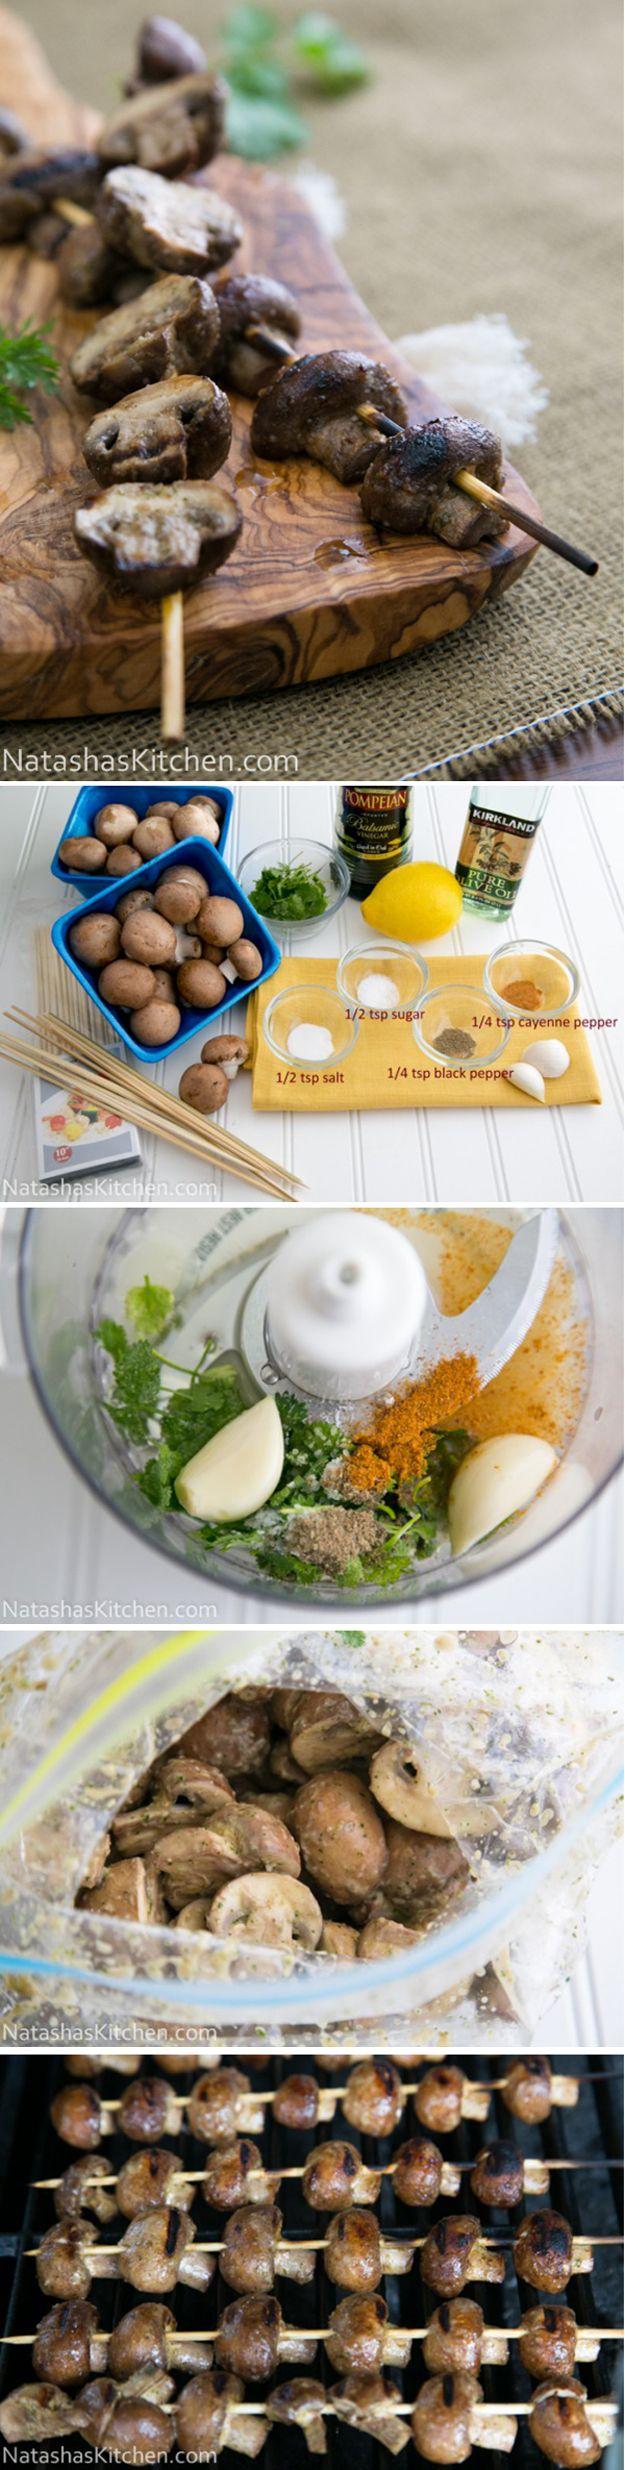 Fácil Grill ideas de recetas de barbacoa | http://artesaniasdebricolaje.ru/diy-recipes-bbq-ideas/